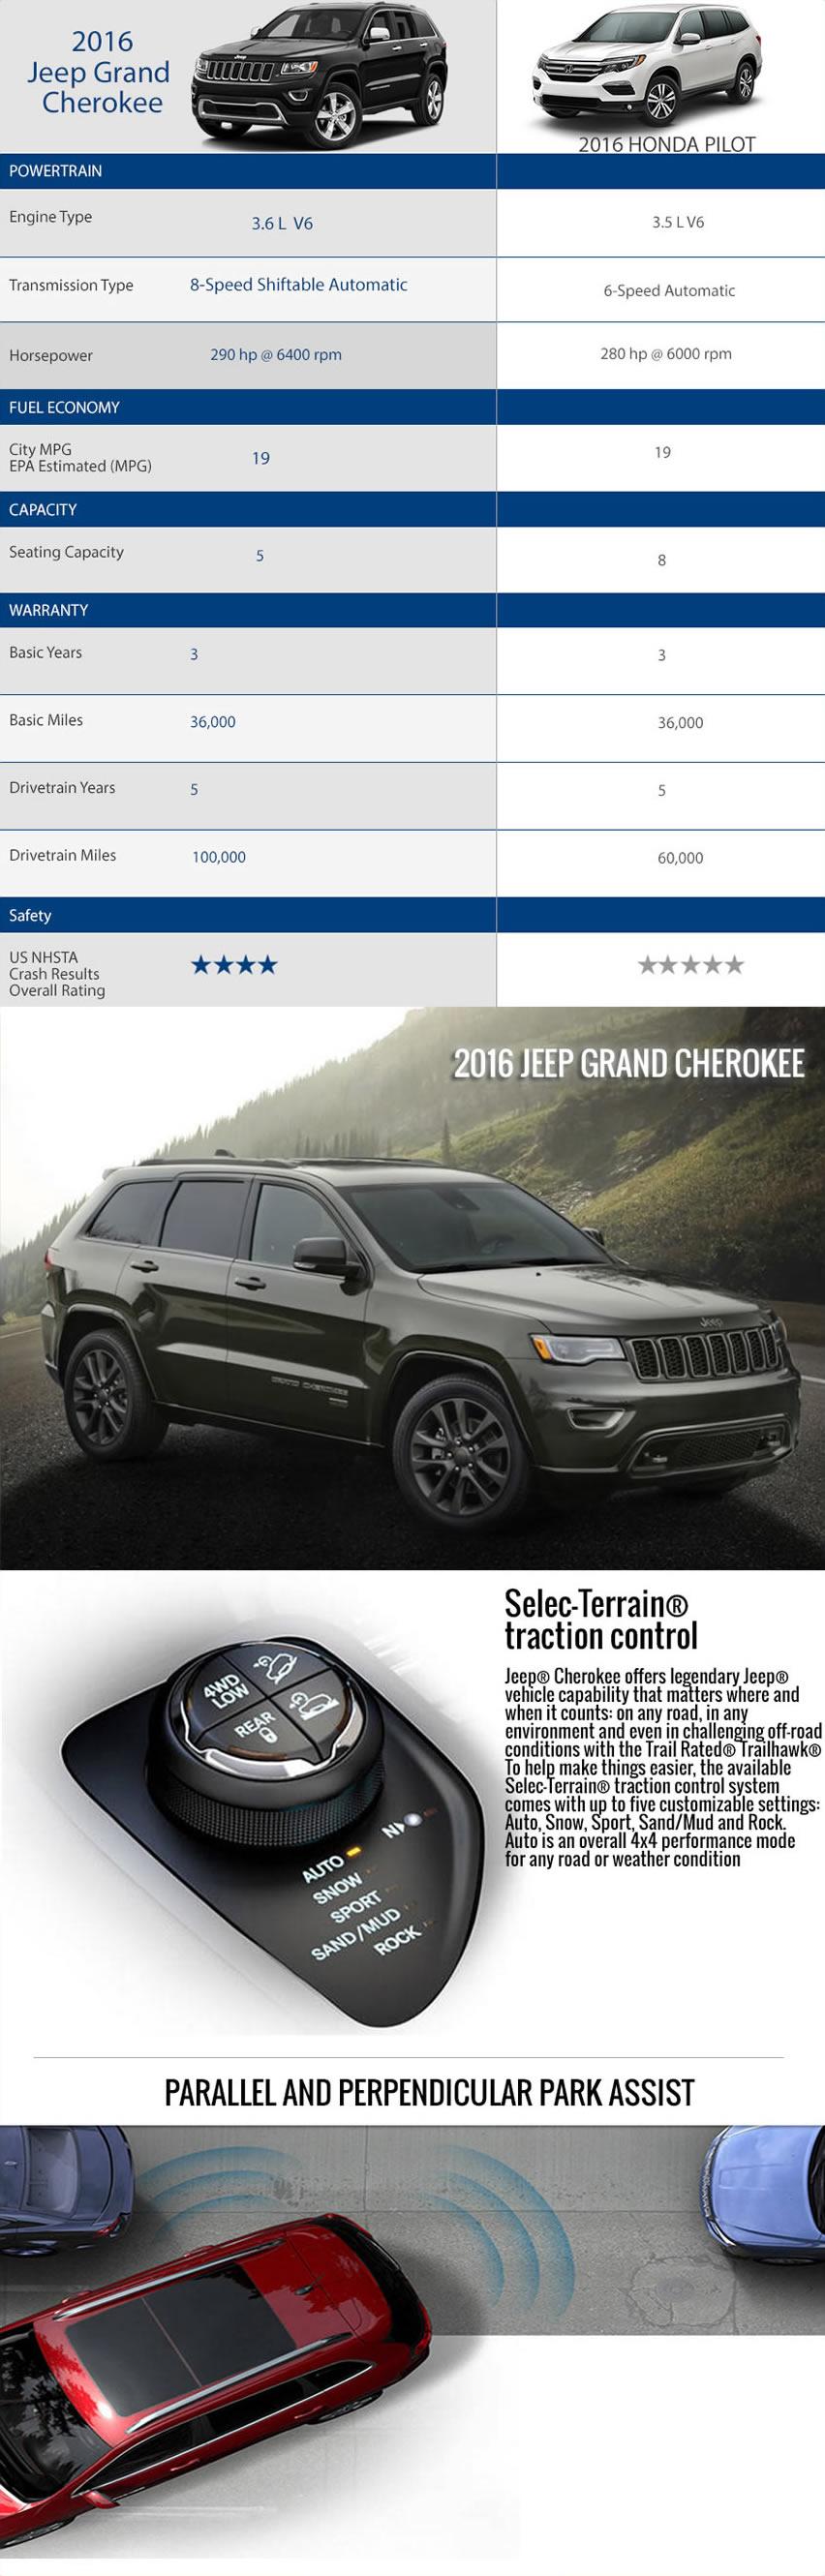 Jeep 2016 Grand Cherokee